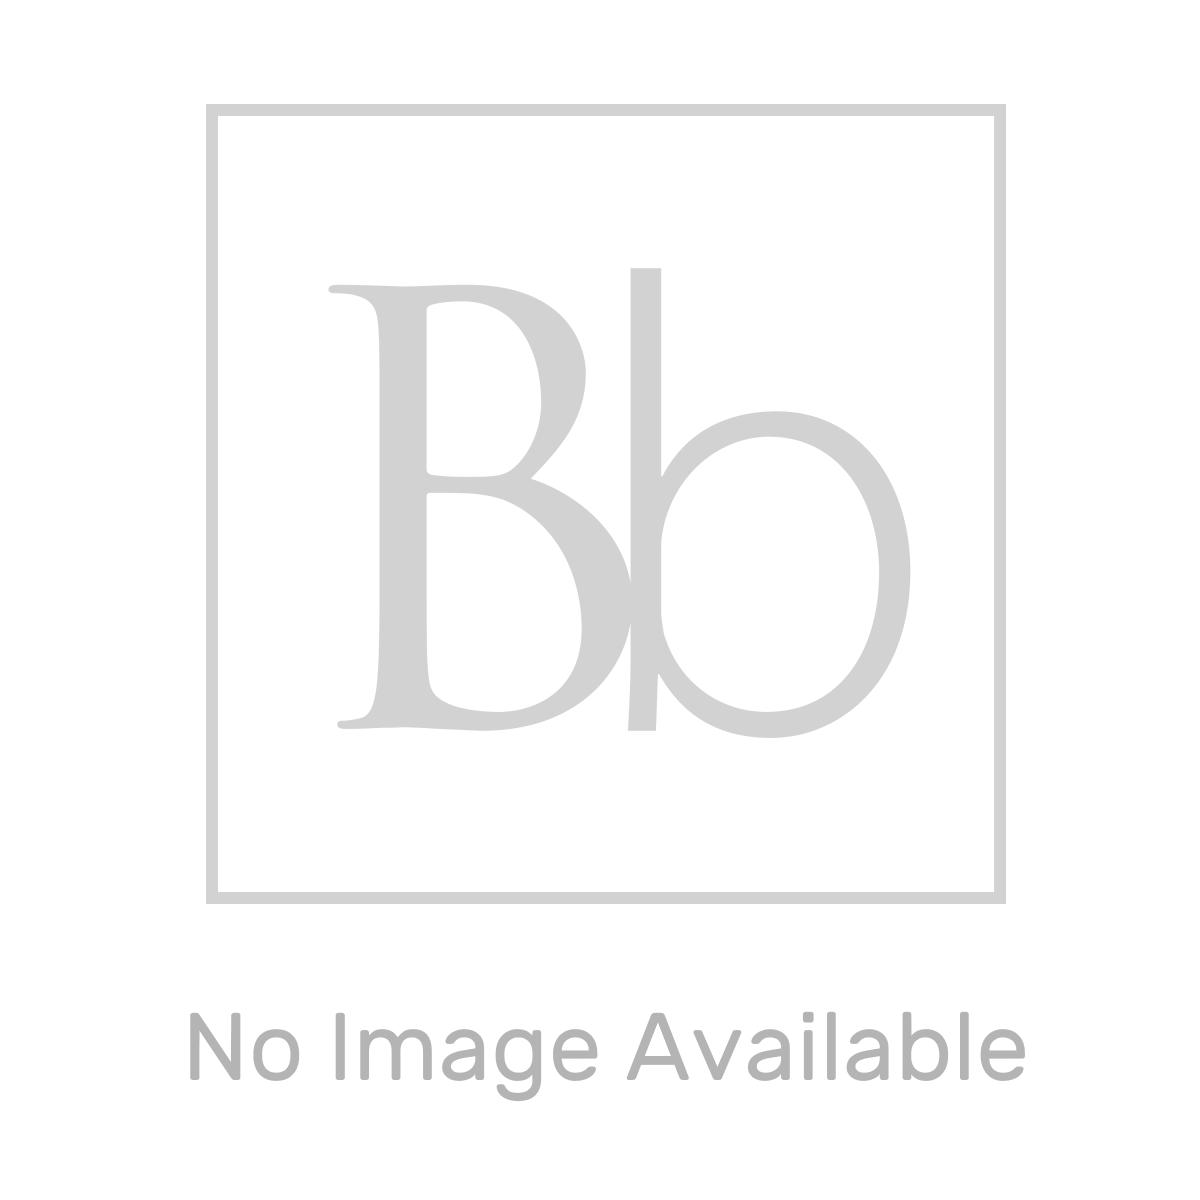 April Black Slate Shower Tray 1400 x 700 Line Drawing